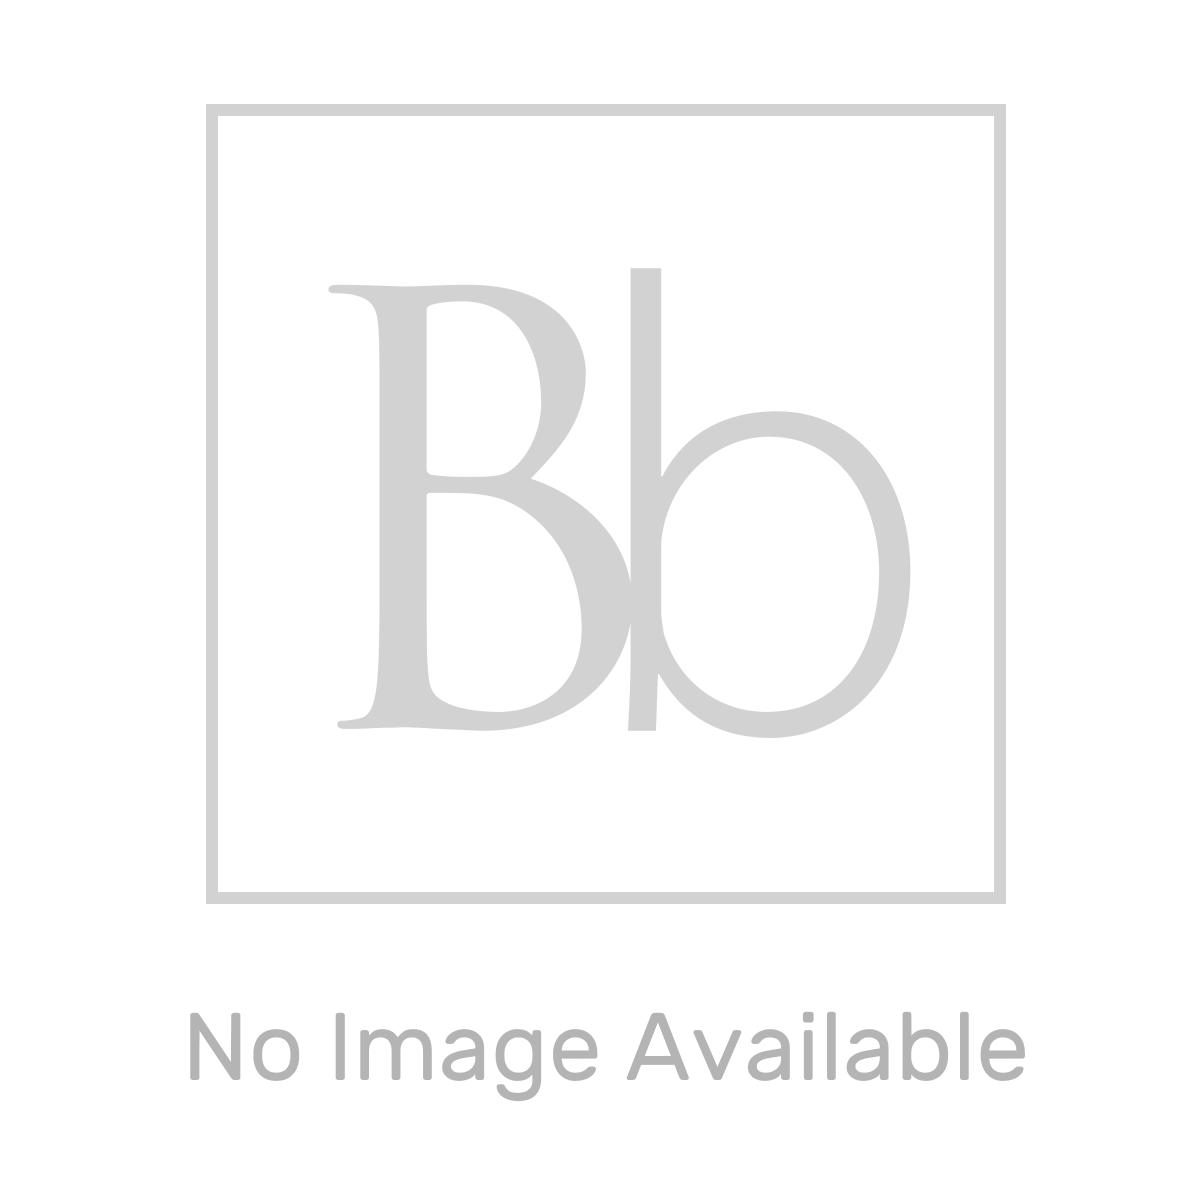 RAK Washington White Bathroom Mirror Cabinet 650mm